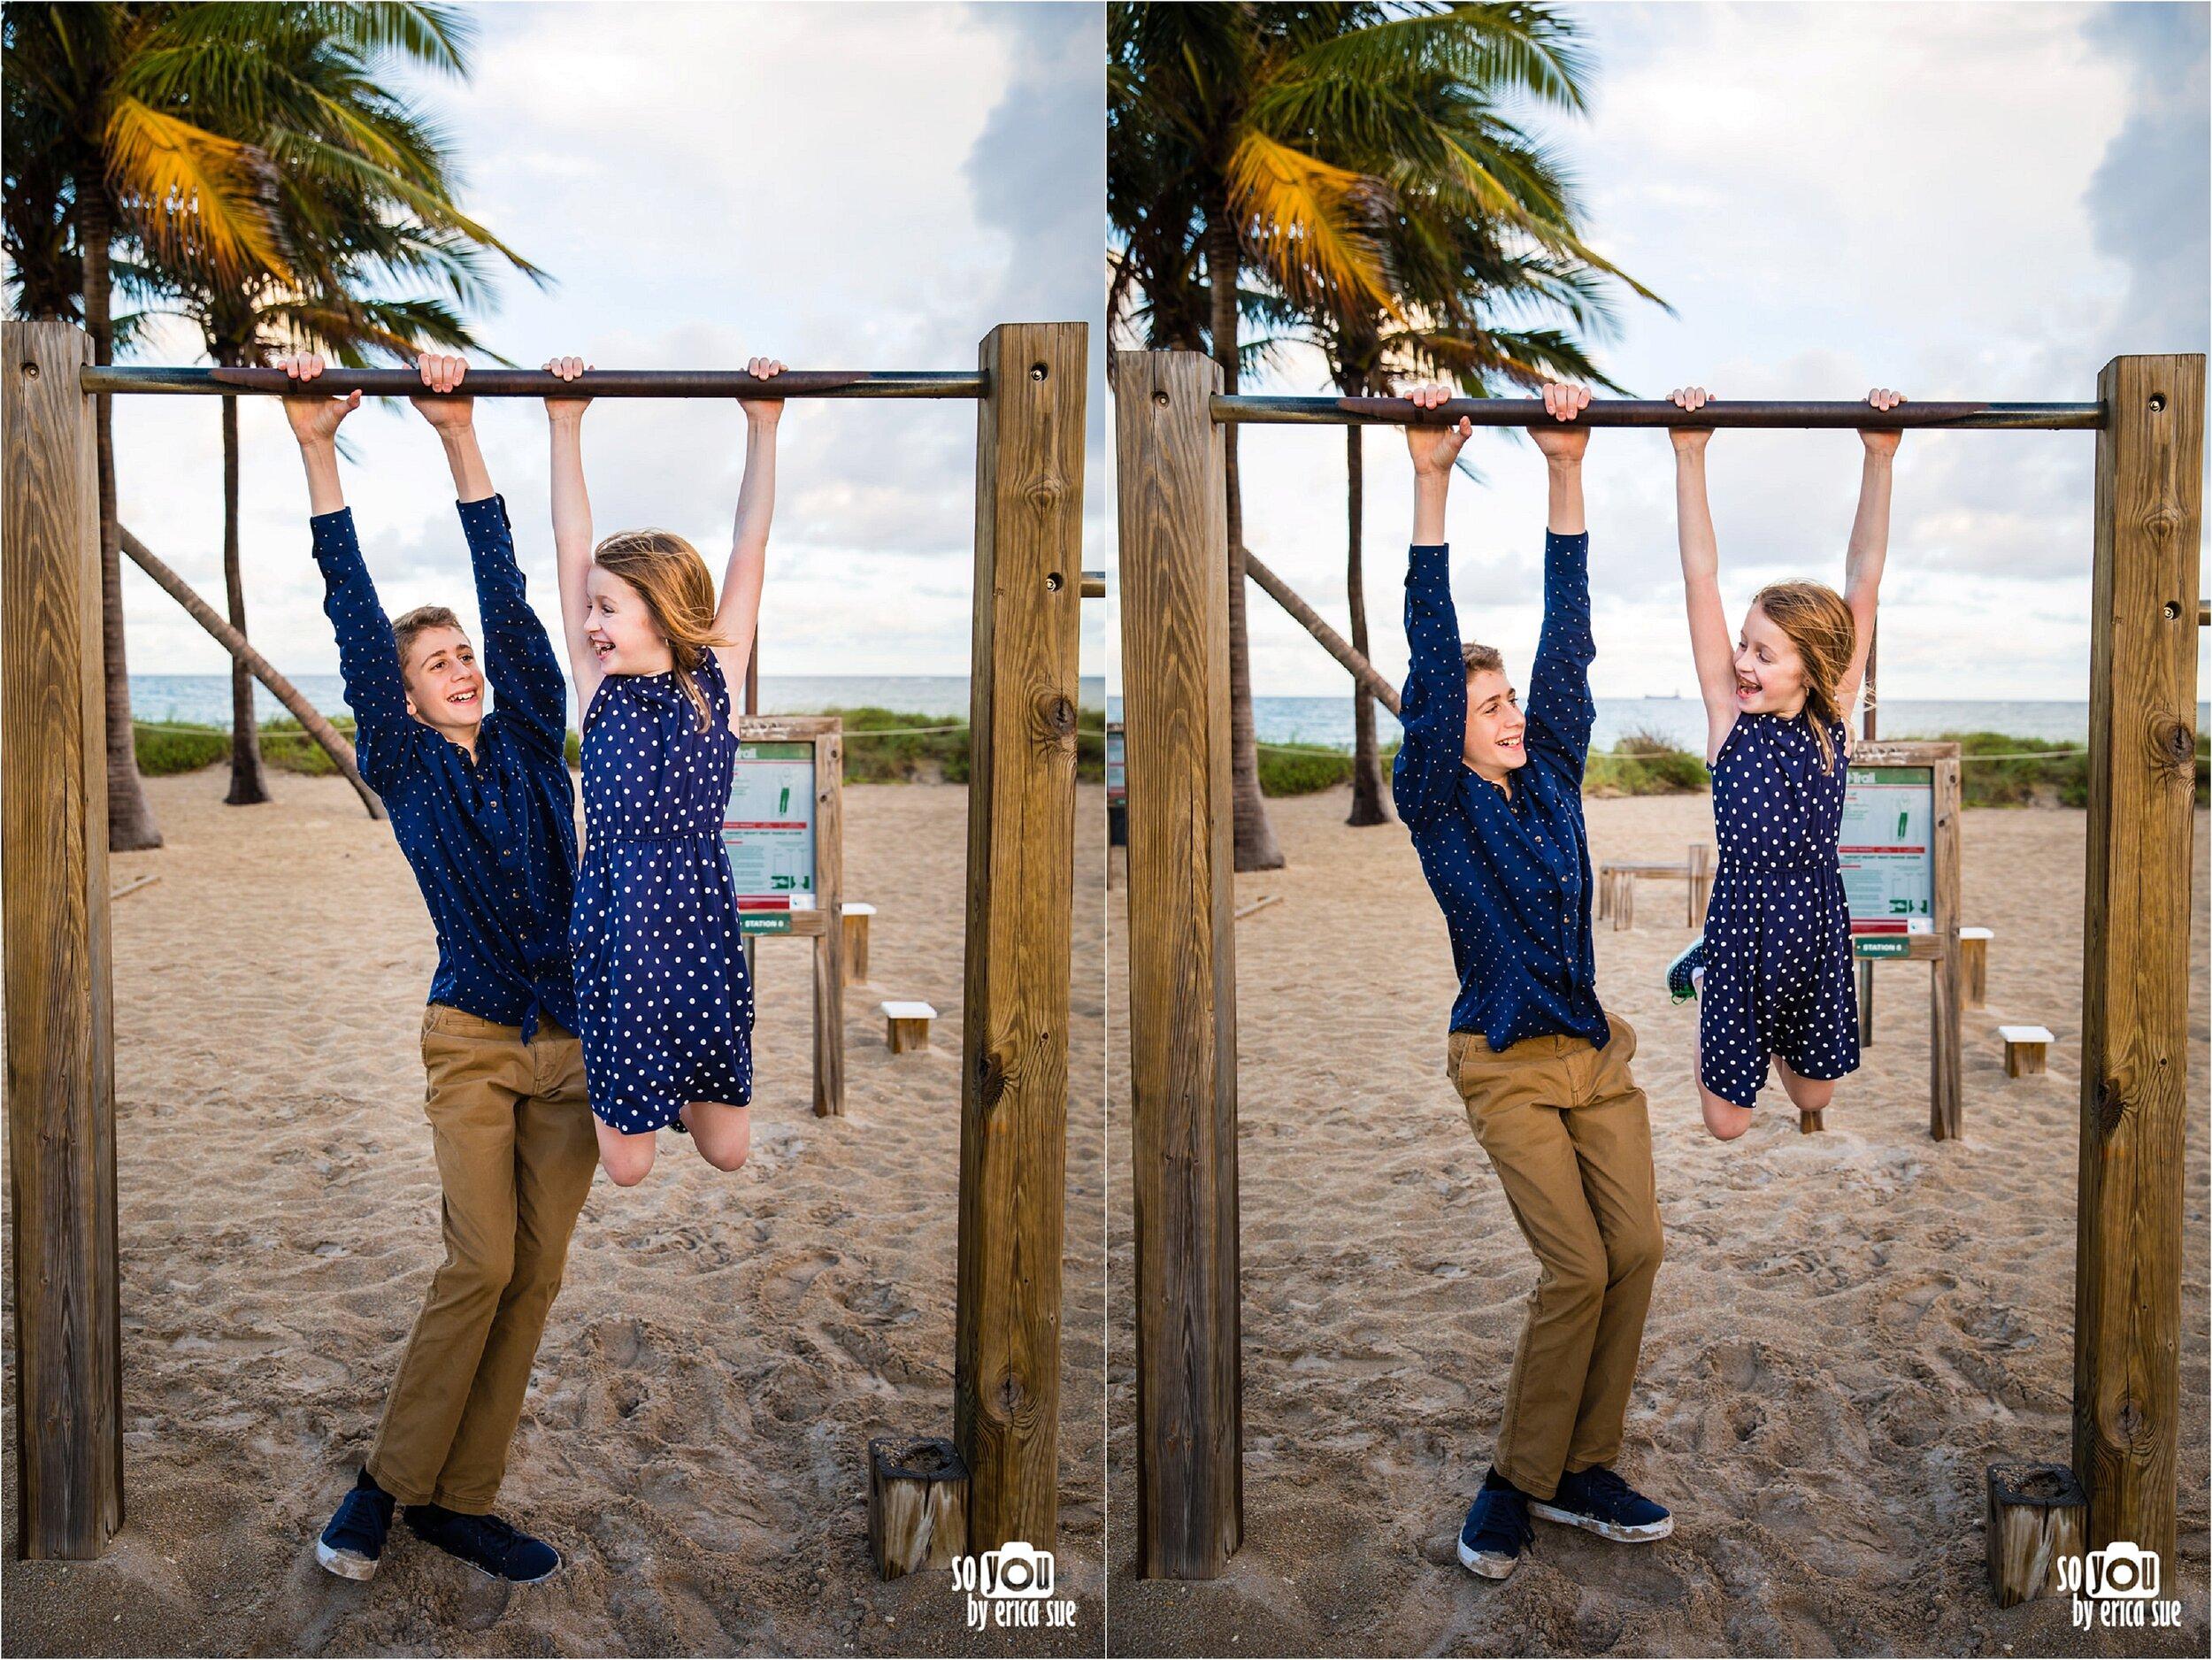 so-you-by-erica-sue-ft-lauderdale-beach-basketball-mitzvah-pre-shoot-9673 (2).JPG